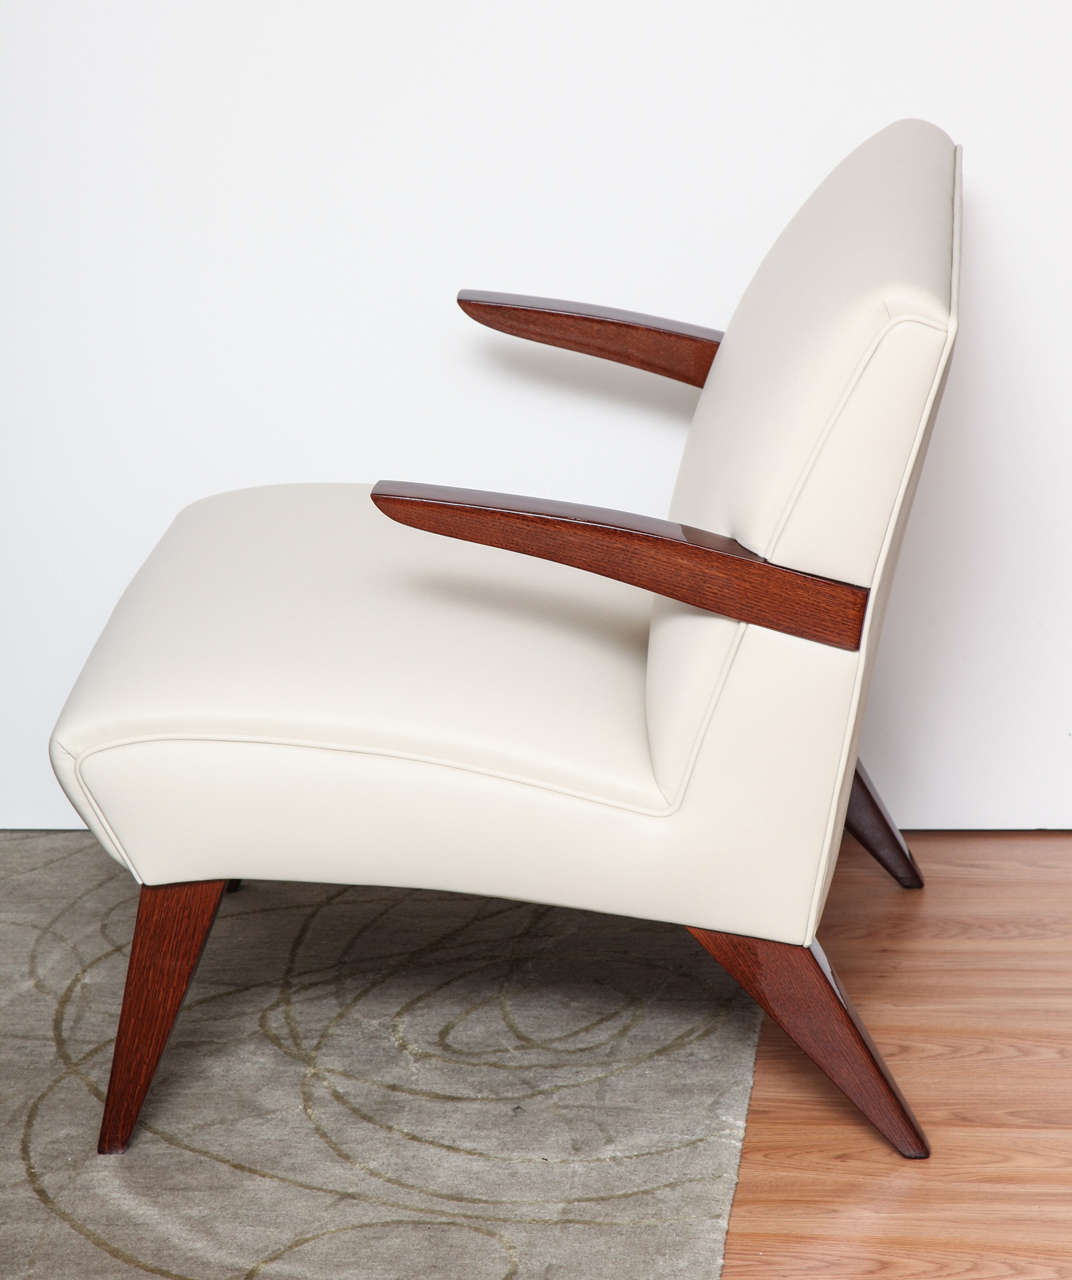 Pair of Art Deco Streamline Lounge Chairs 3